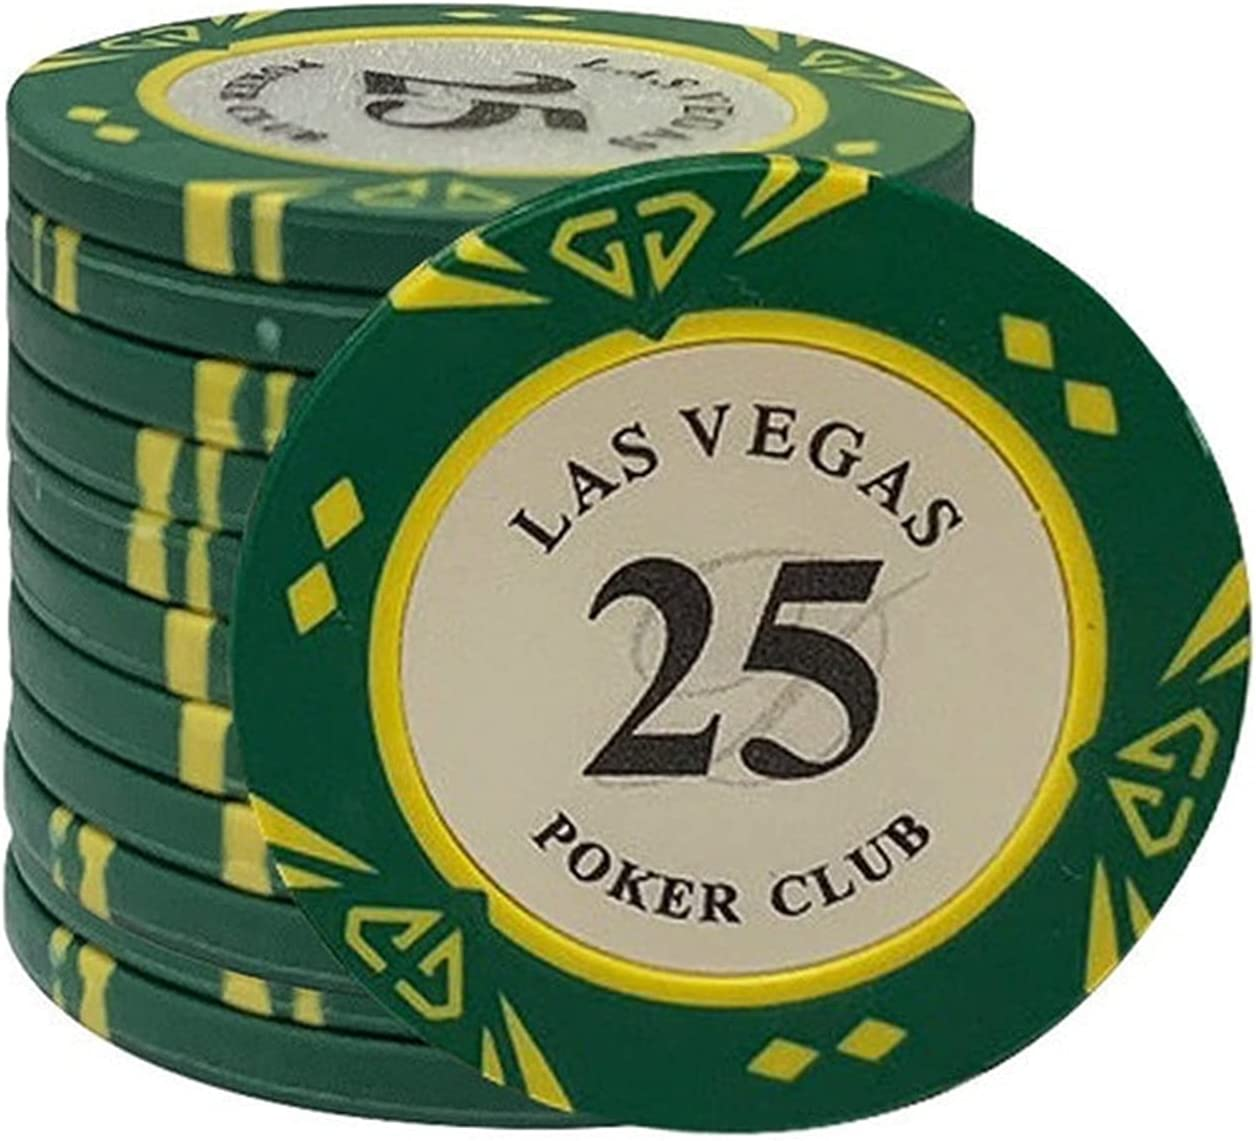 SFGH Poker Chip Set Metal Some reservation Coin Poke Vegas Chips National uniform free shipping Dollar Las